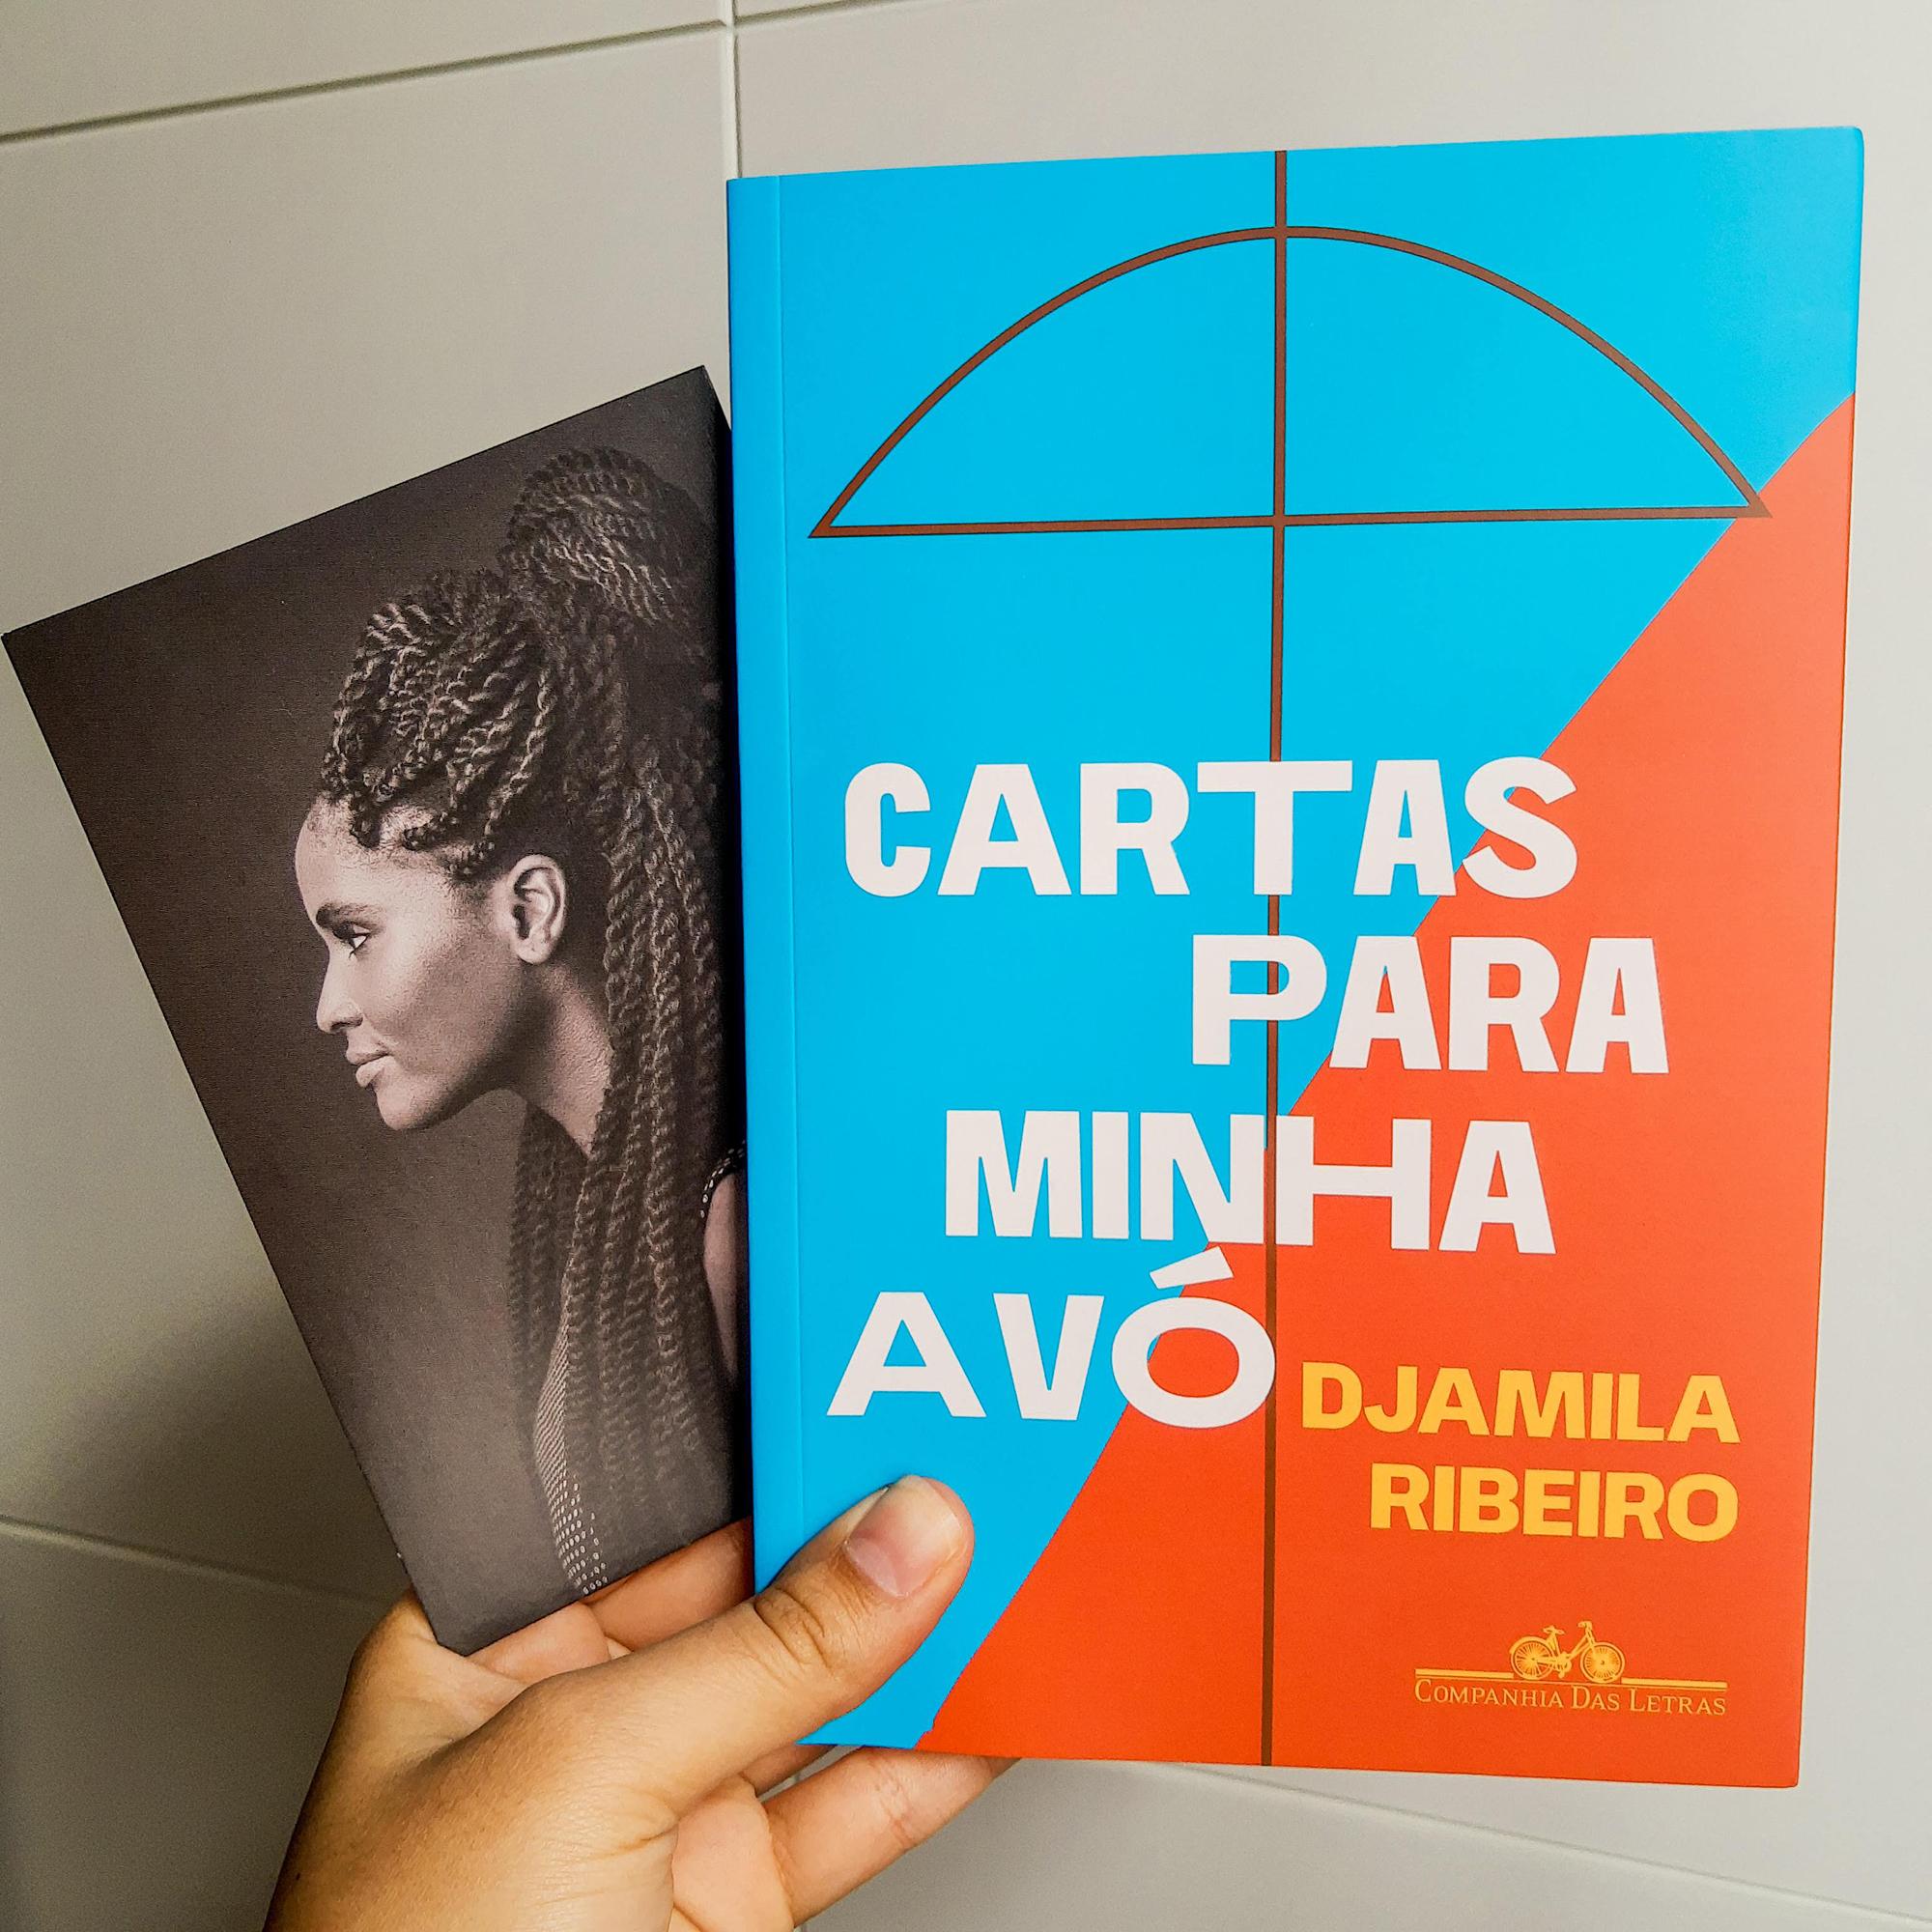 Cartas para minha avó Djamila Ribeiro